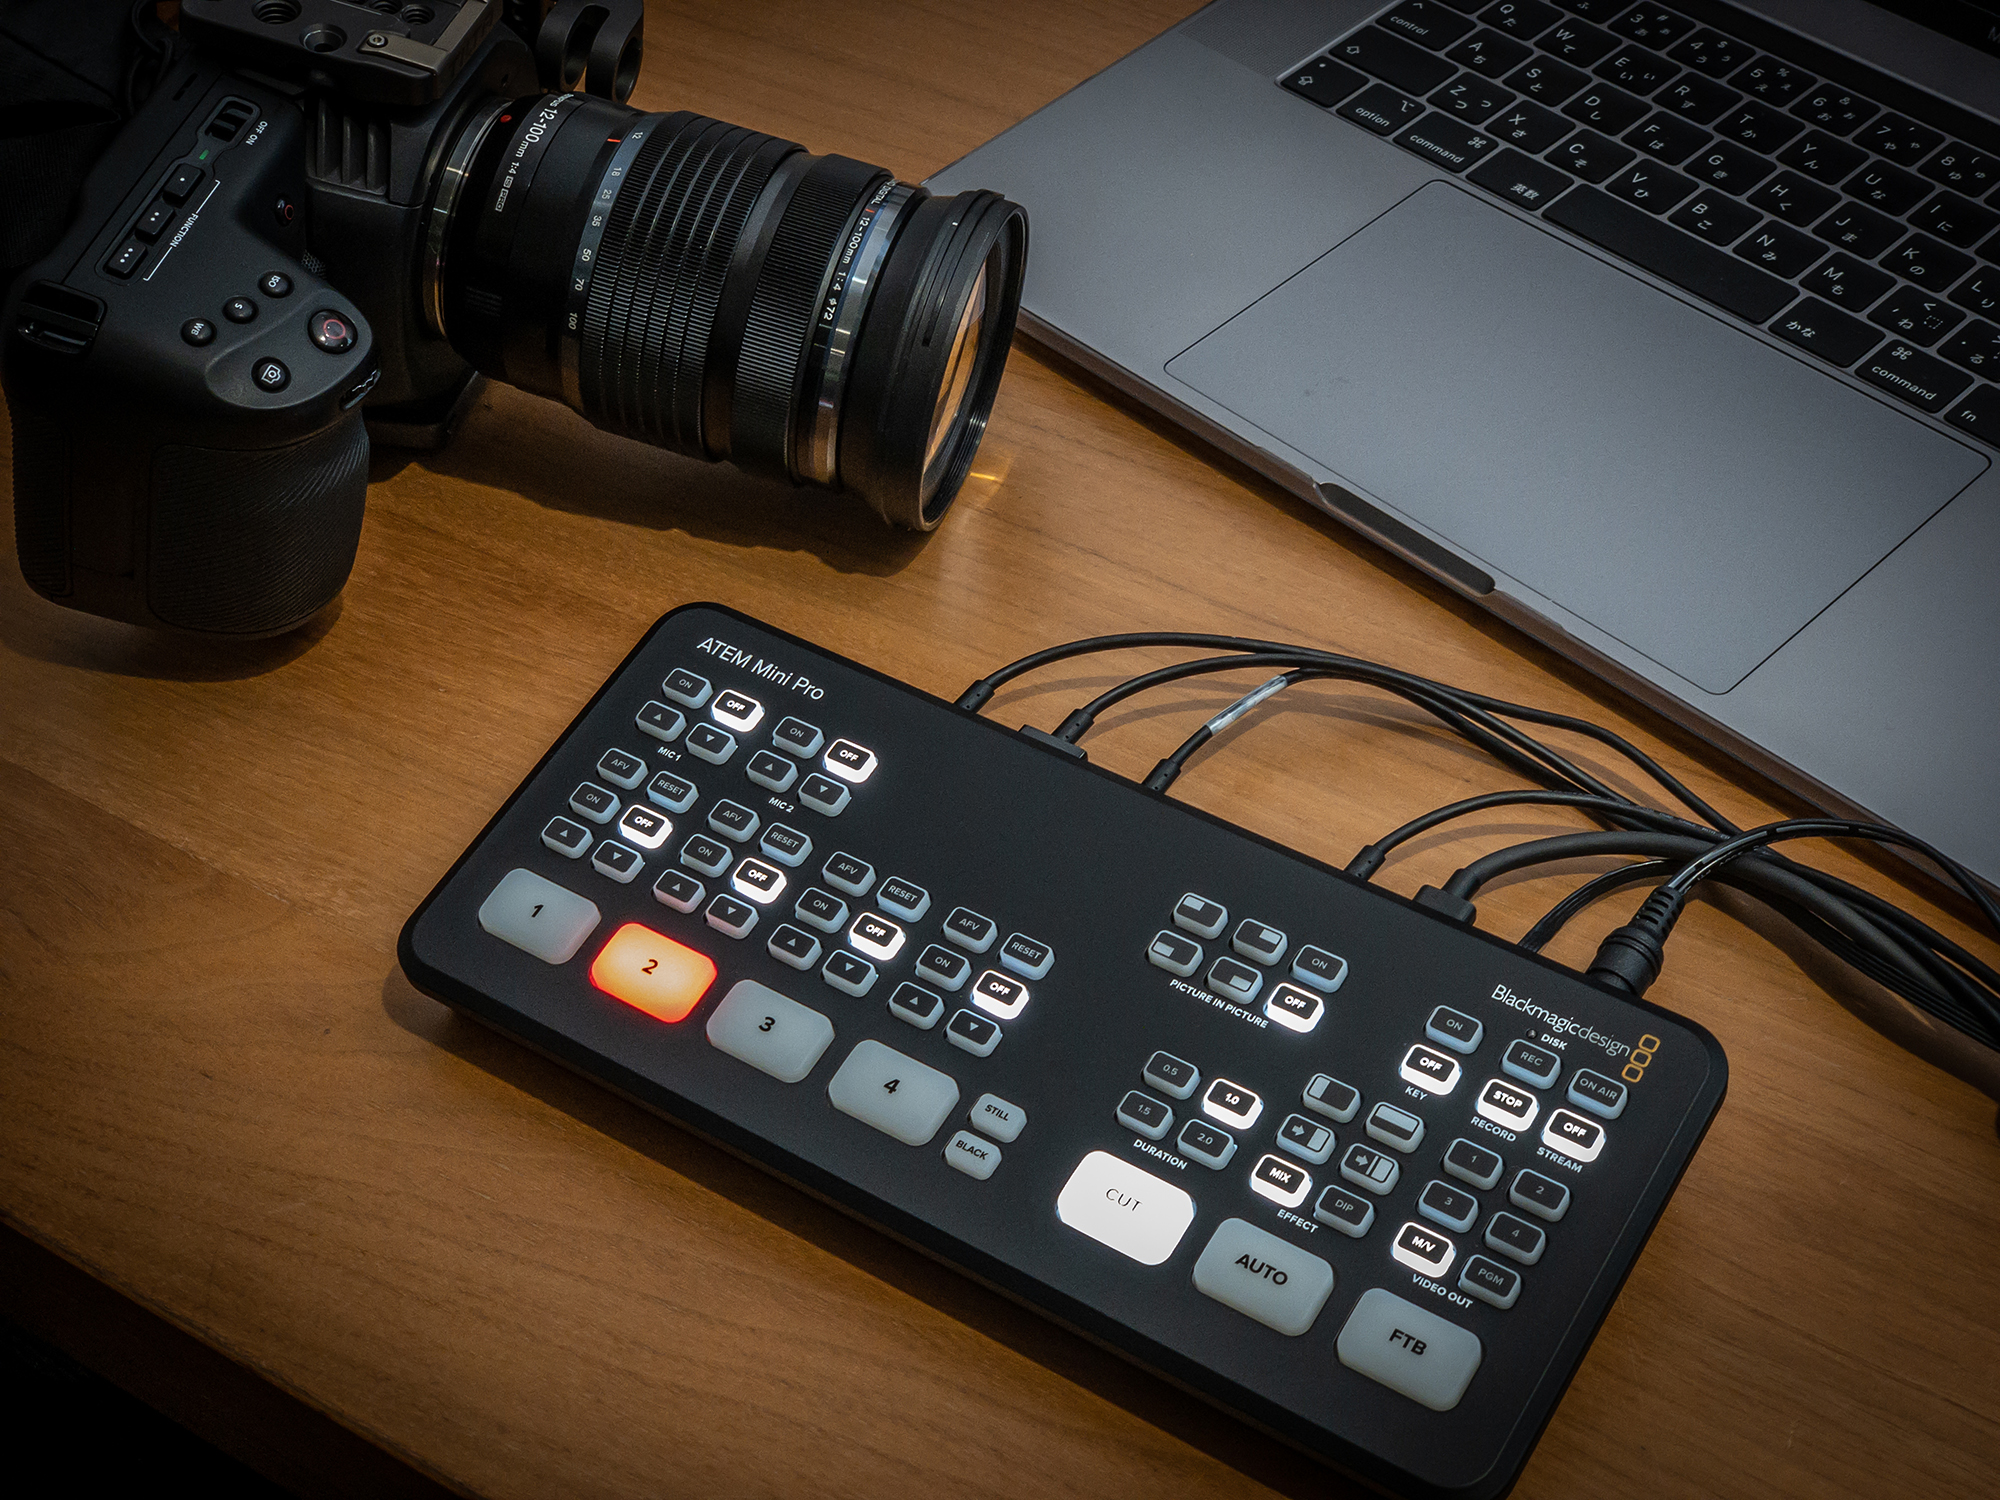 BlackmagicDesign 配信ソリューション ATEM Mini Pro / BMPCC / HORIC HDMIテスト